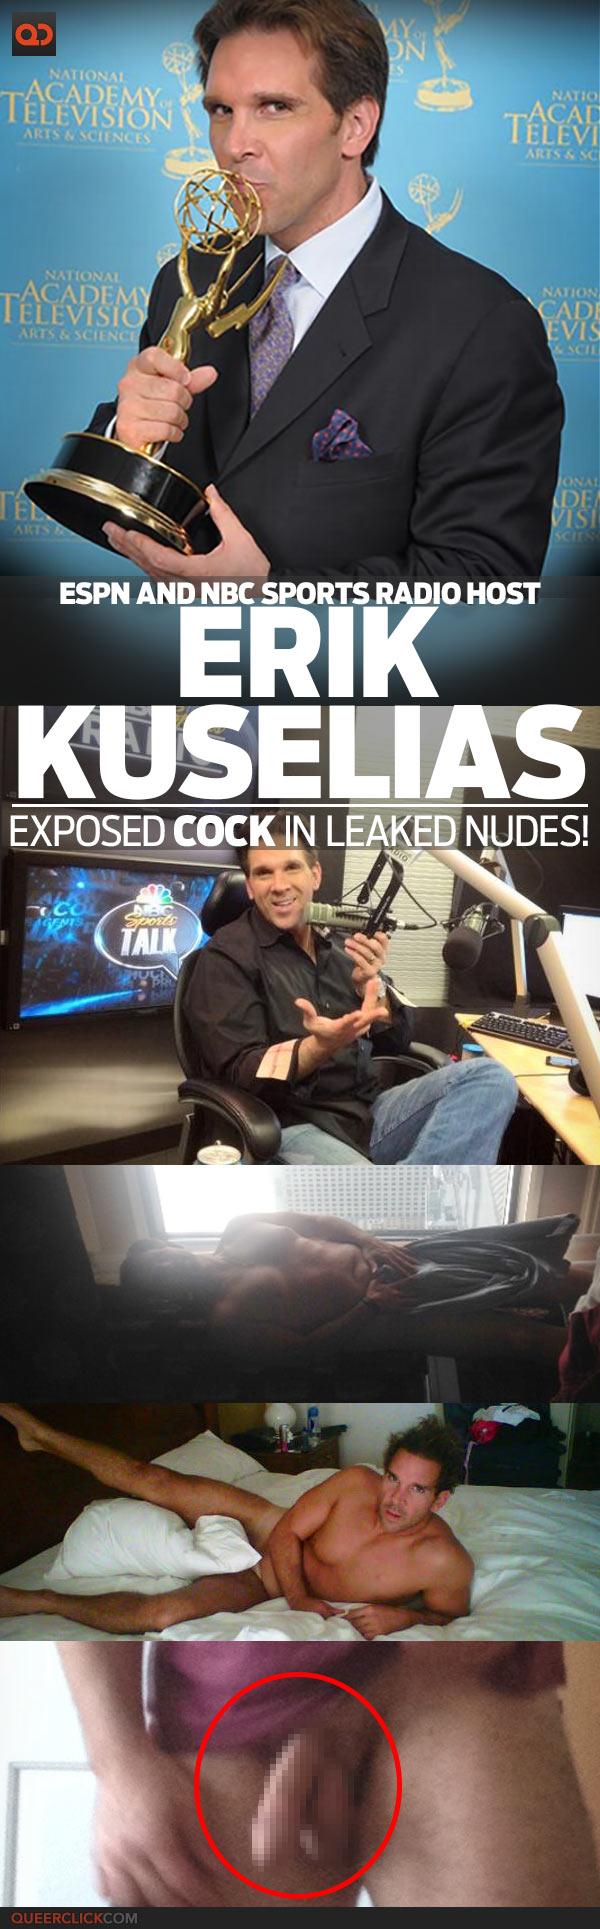 Erik Kuselias, ESPN And NBC Sports Radio Host, Exposed Cock In Leaked Nudes!